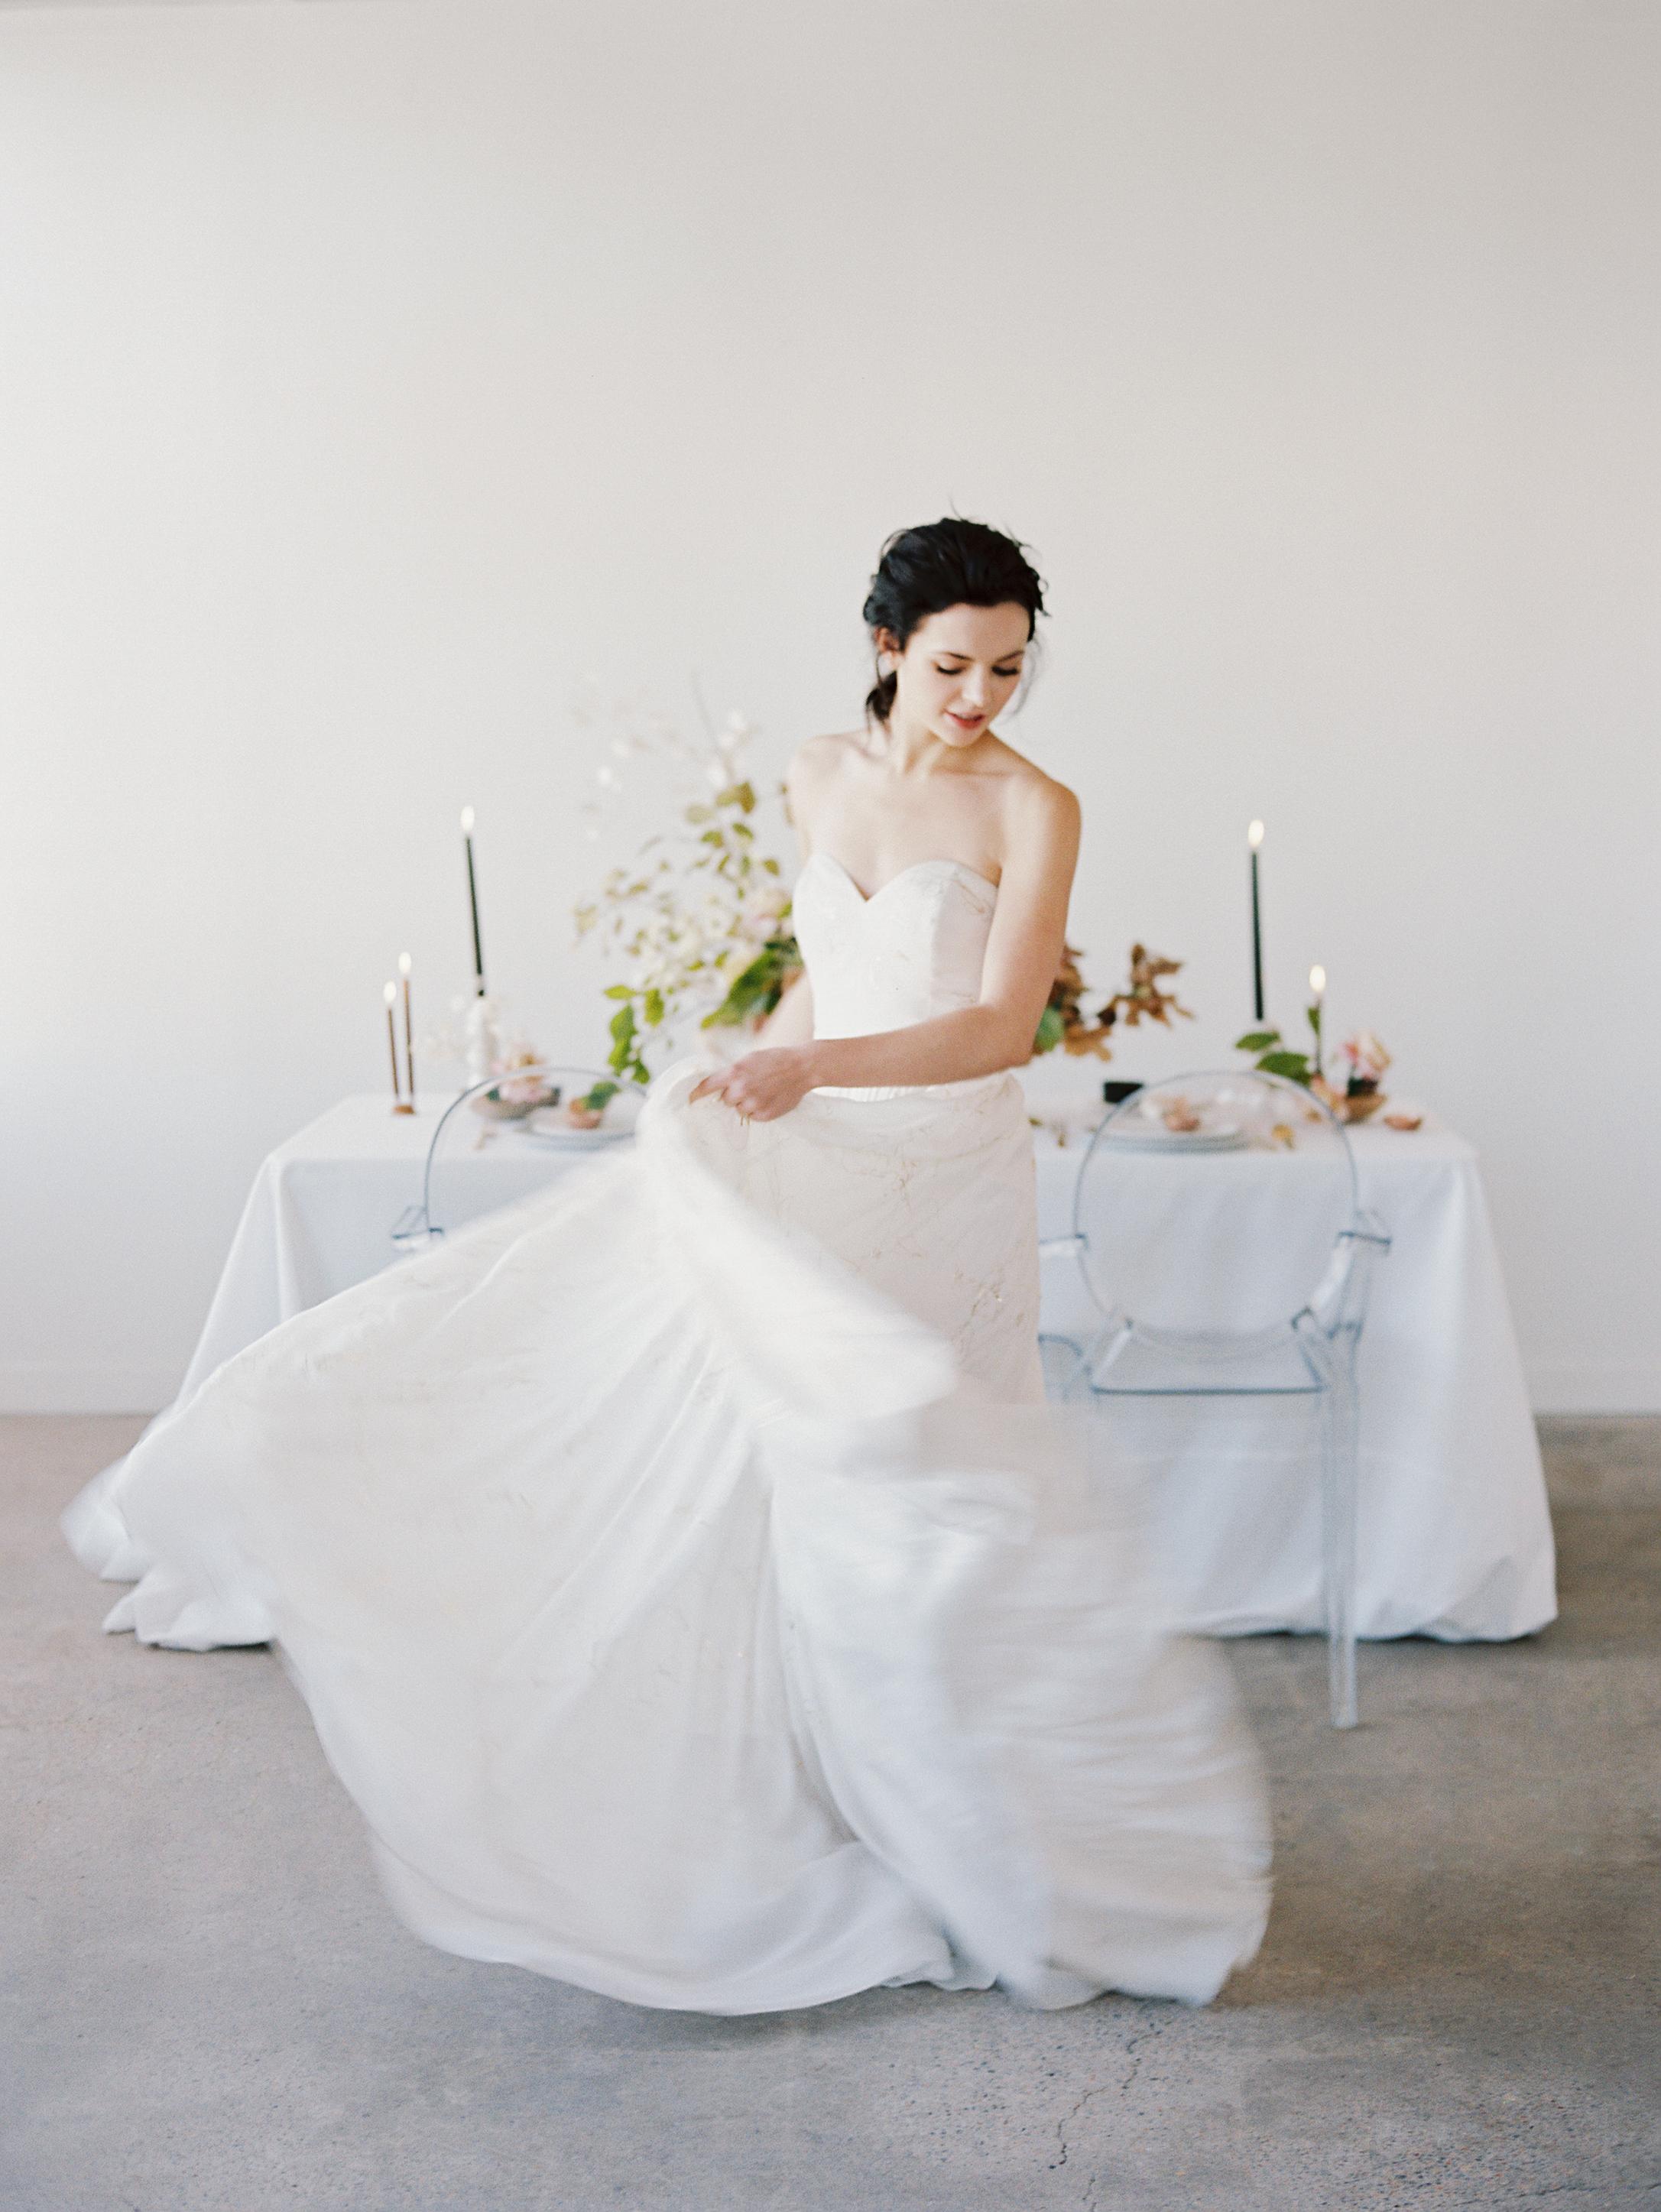 Sentient Floral Workshop-Carrie King Photographer-026.jpg